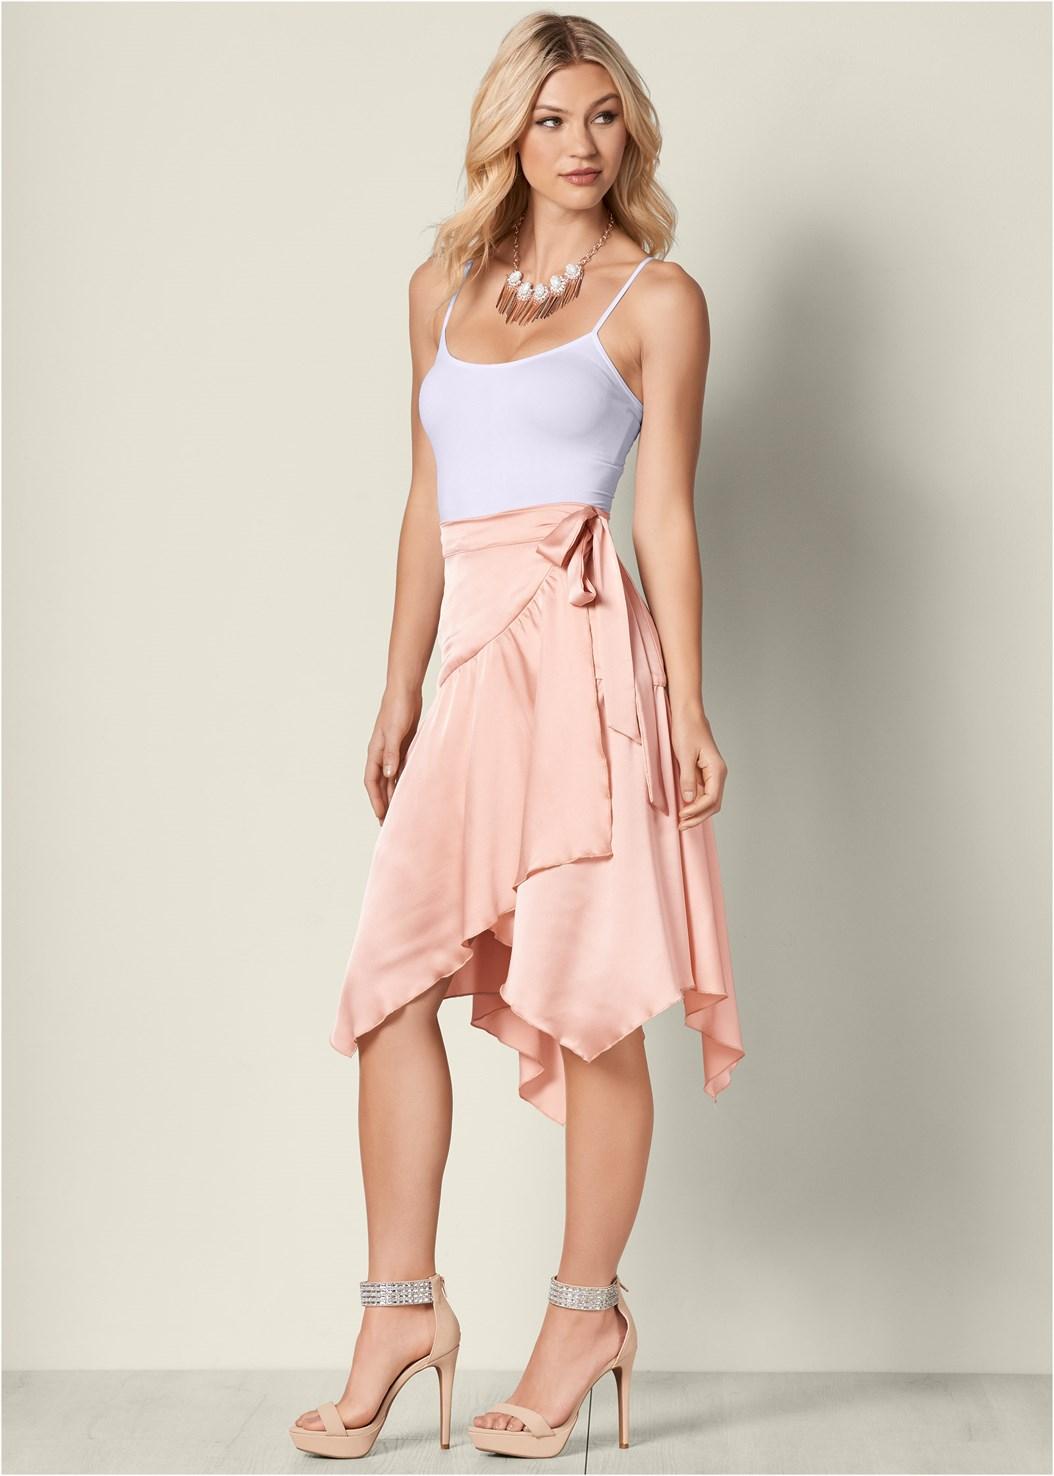 Wrap Midi Skirt,Basic Cami Two Pack